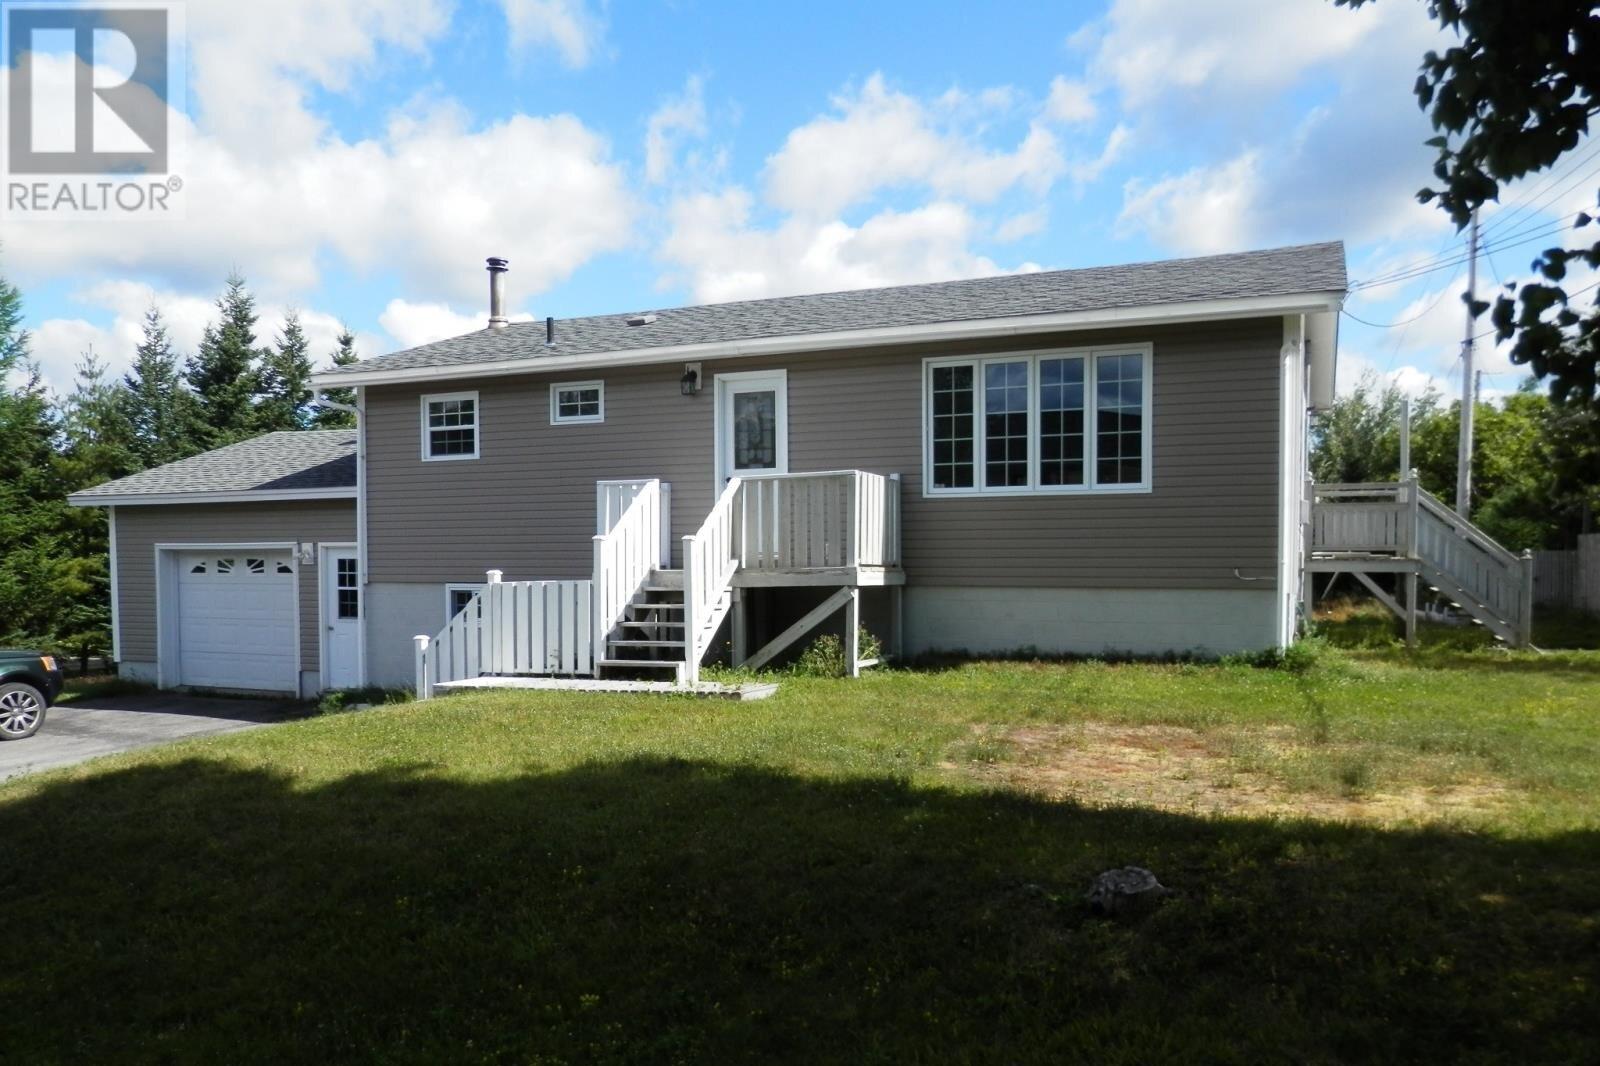 House for sale at 6 Seaview Te Gambo Newfoundland - MLS: 1218845